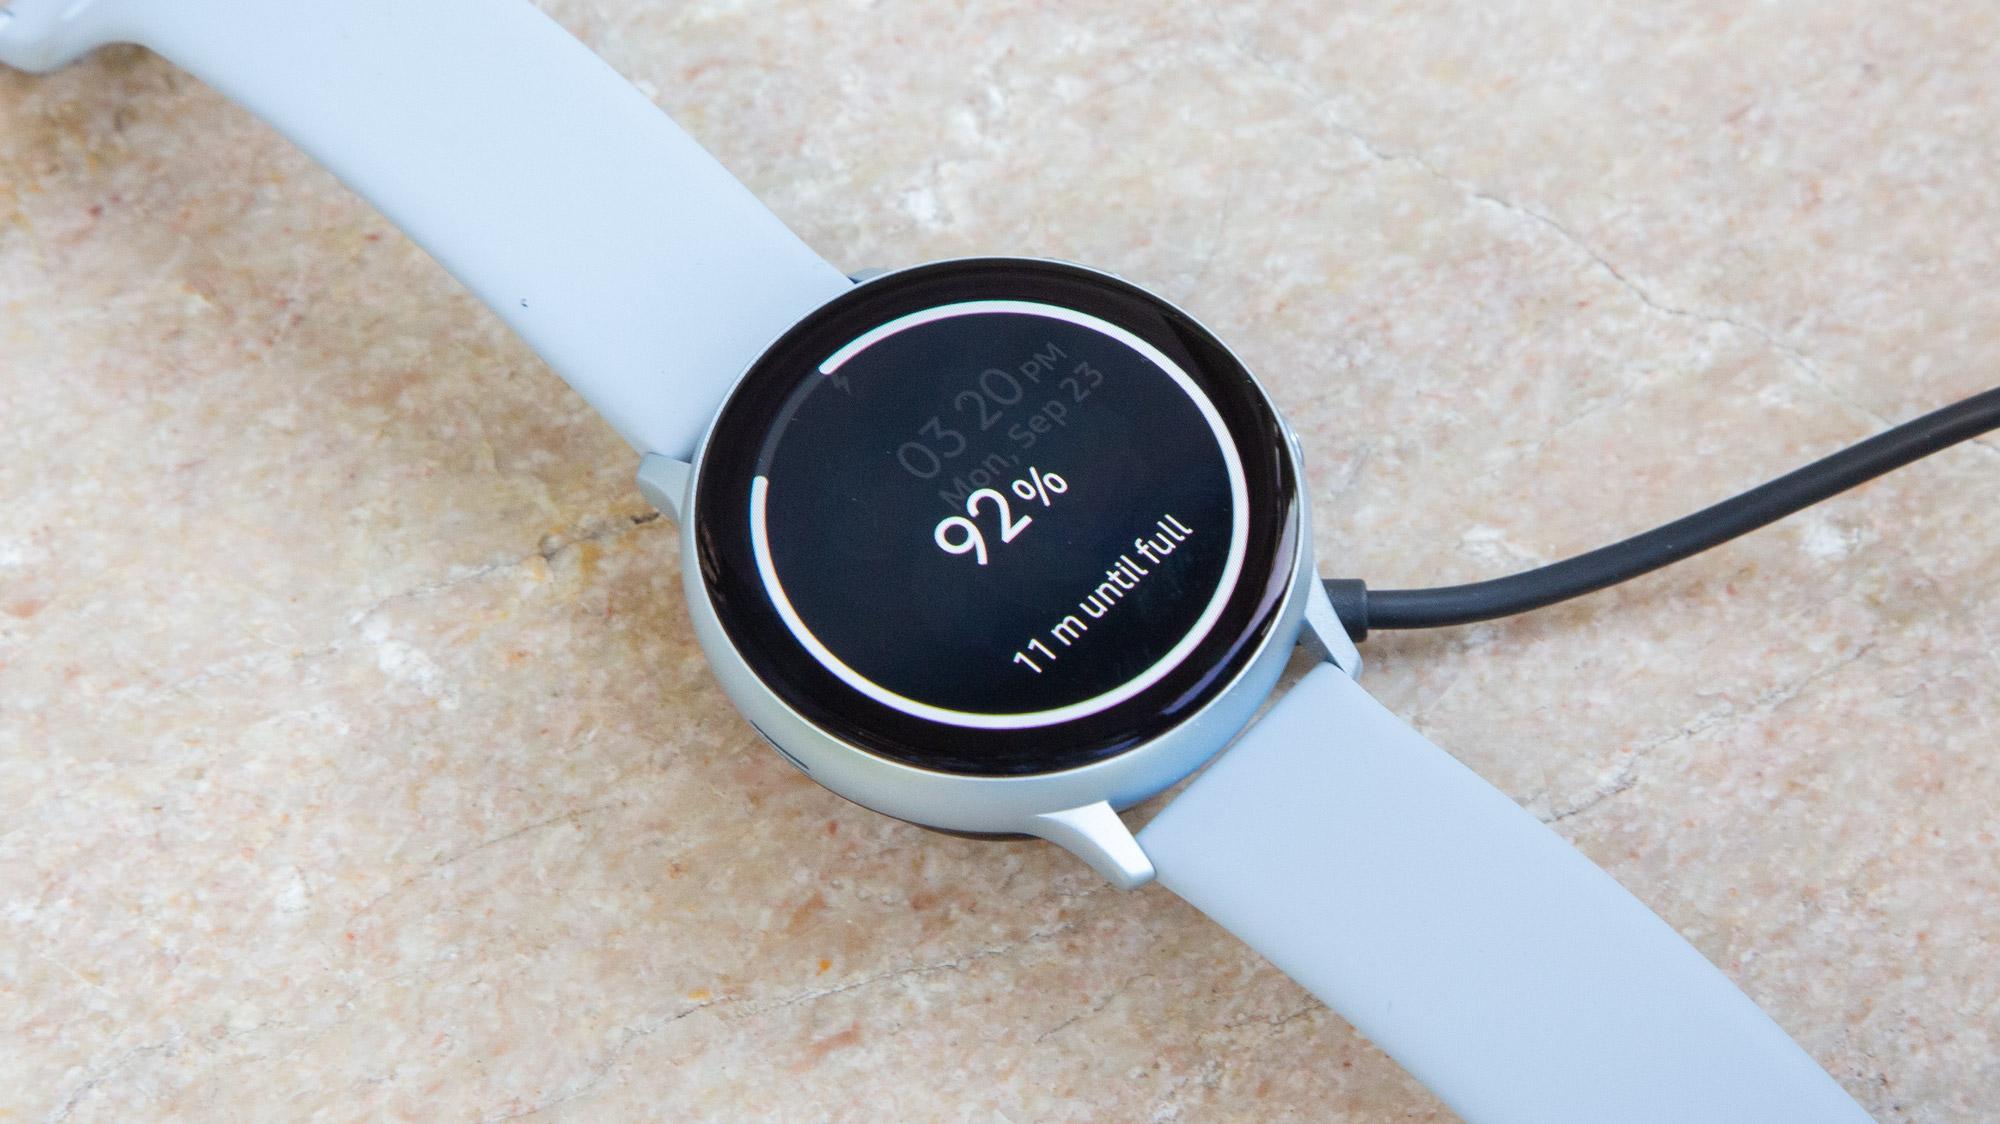 new galaxy watch release date 2020